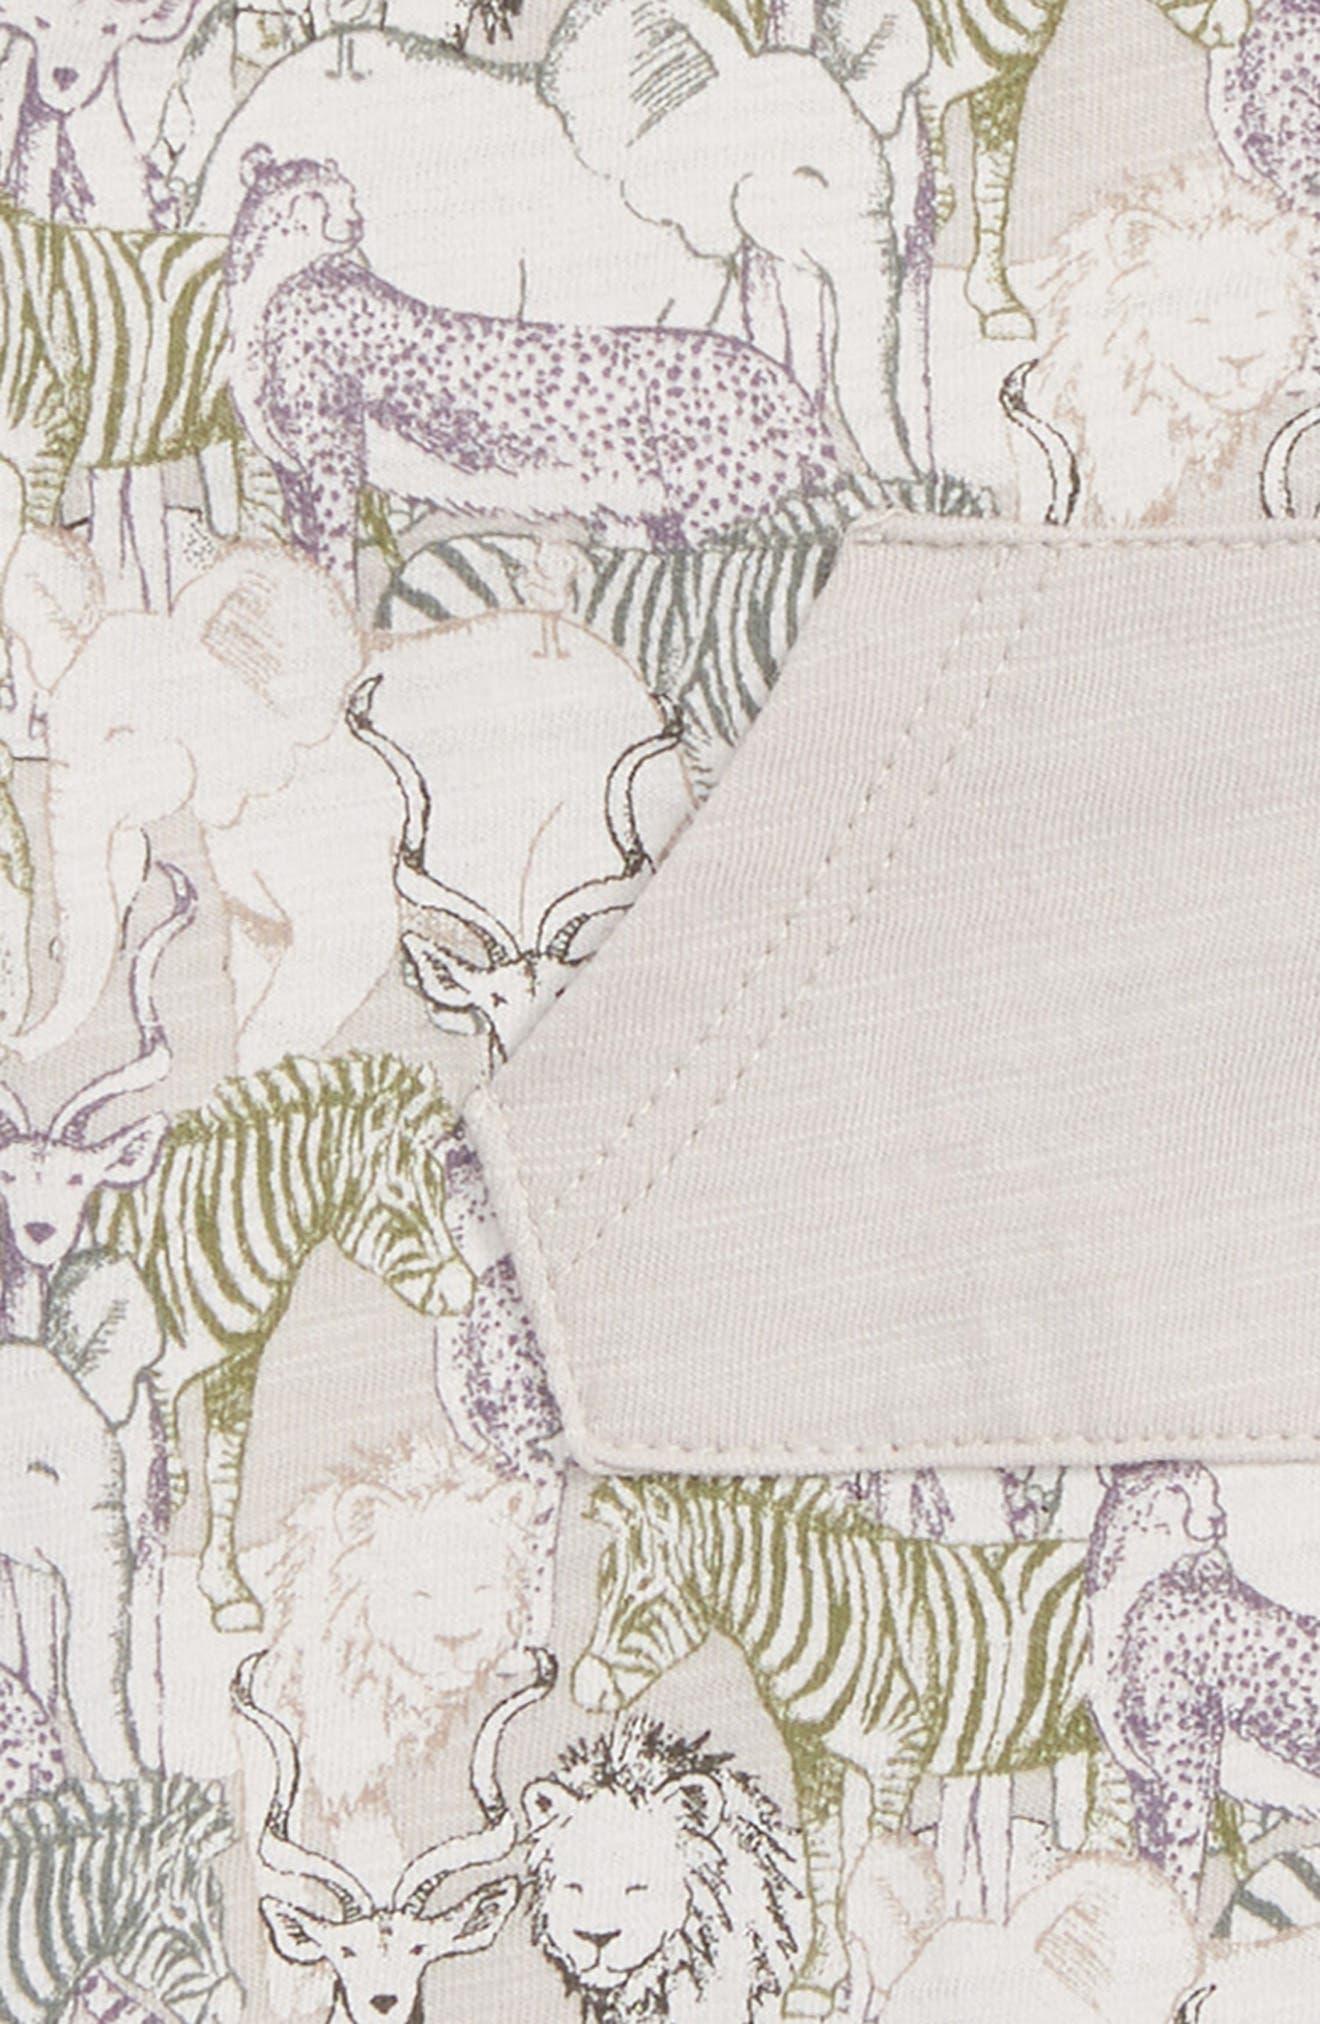 Peek Owen Bubble Romper,                             Alternate thumbnail 3, color,                             Grey